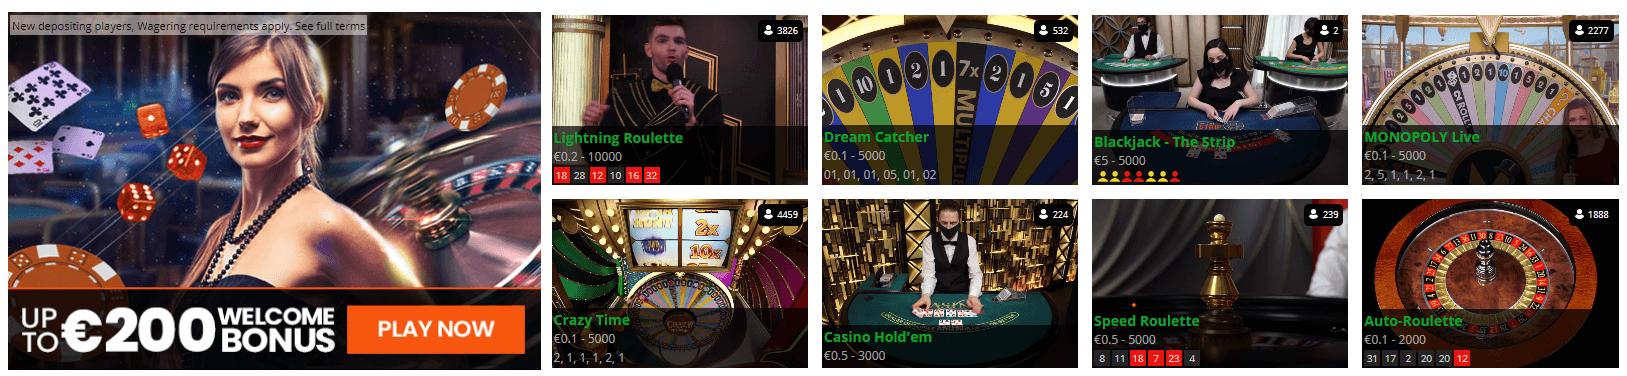 mrmega casino live games